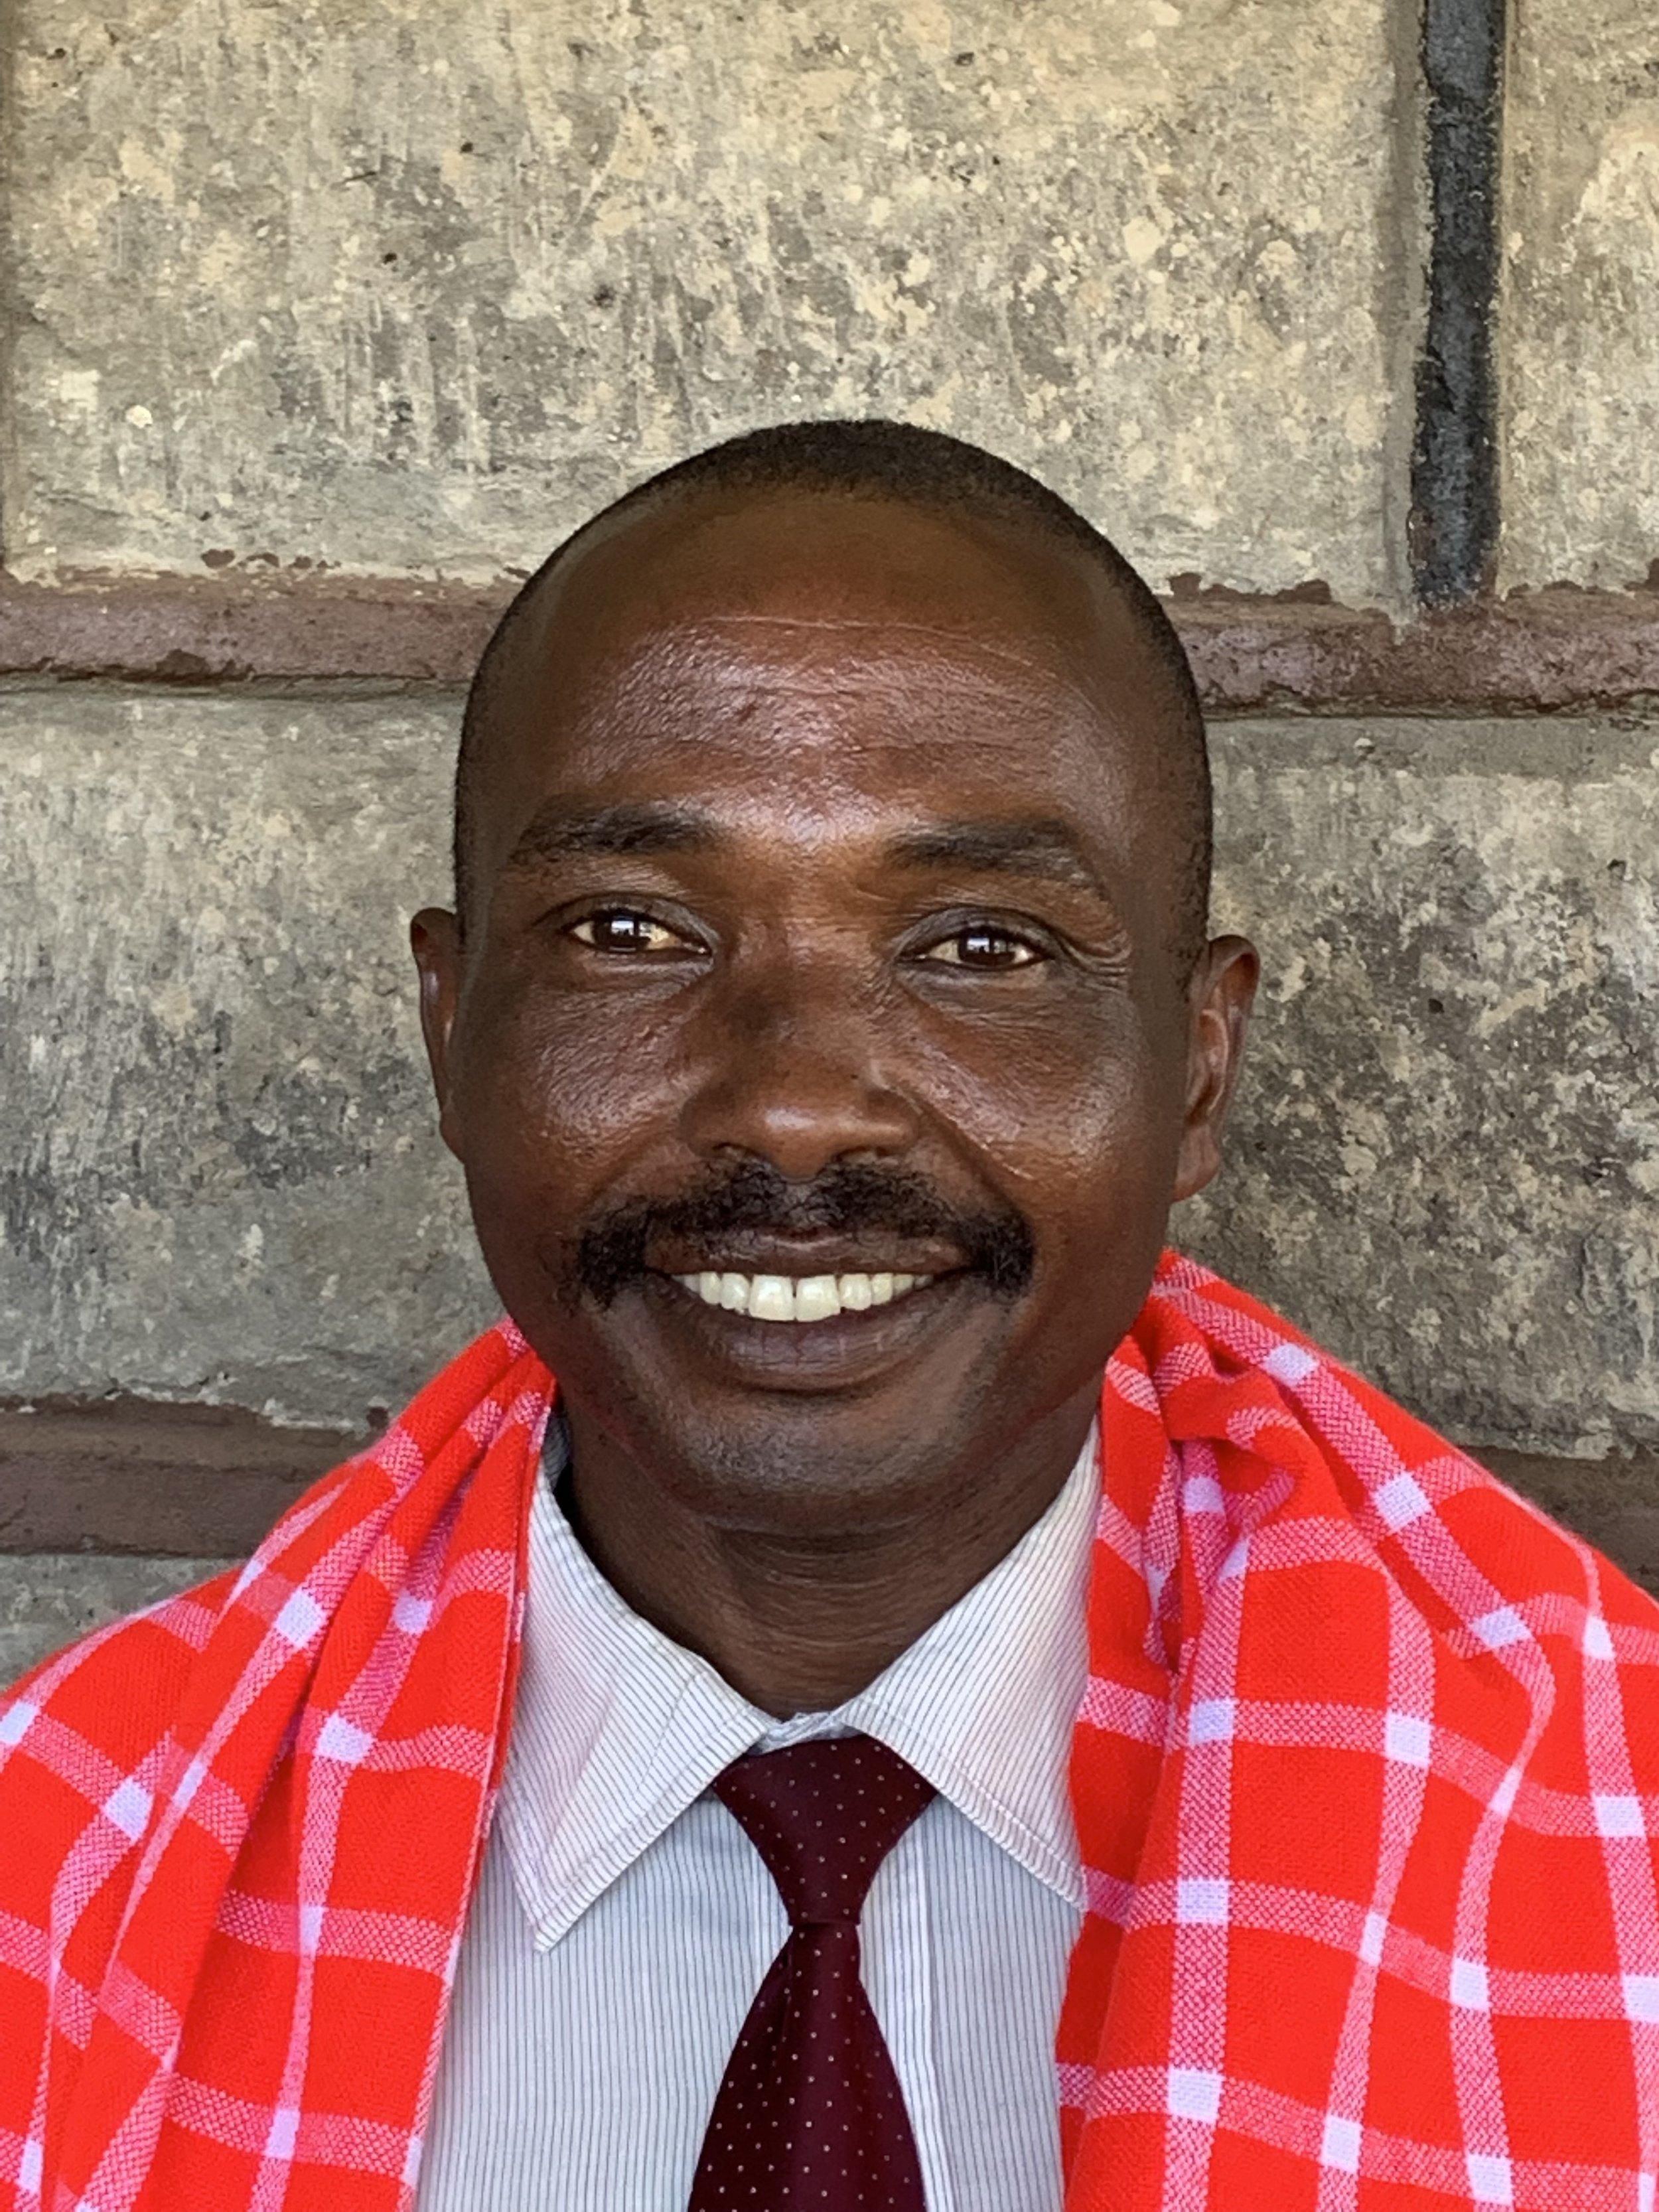 Patrick Muyia - $150 Sponsorship